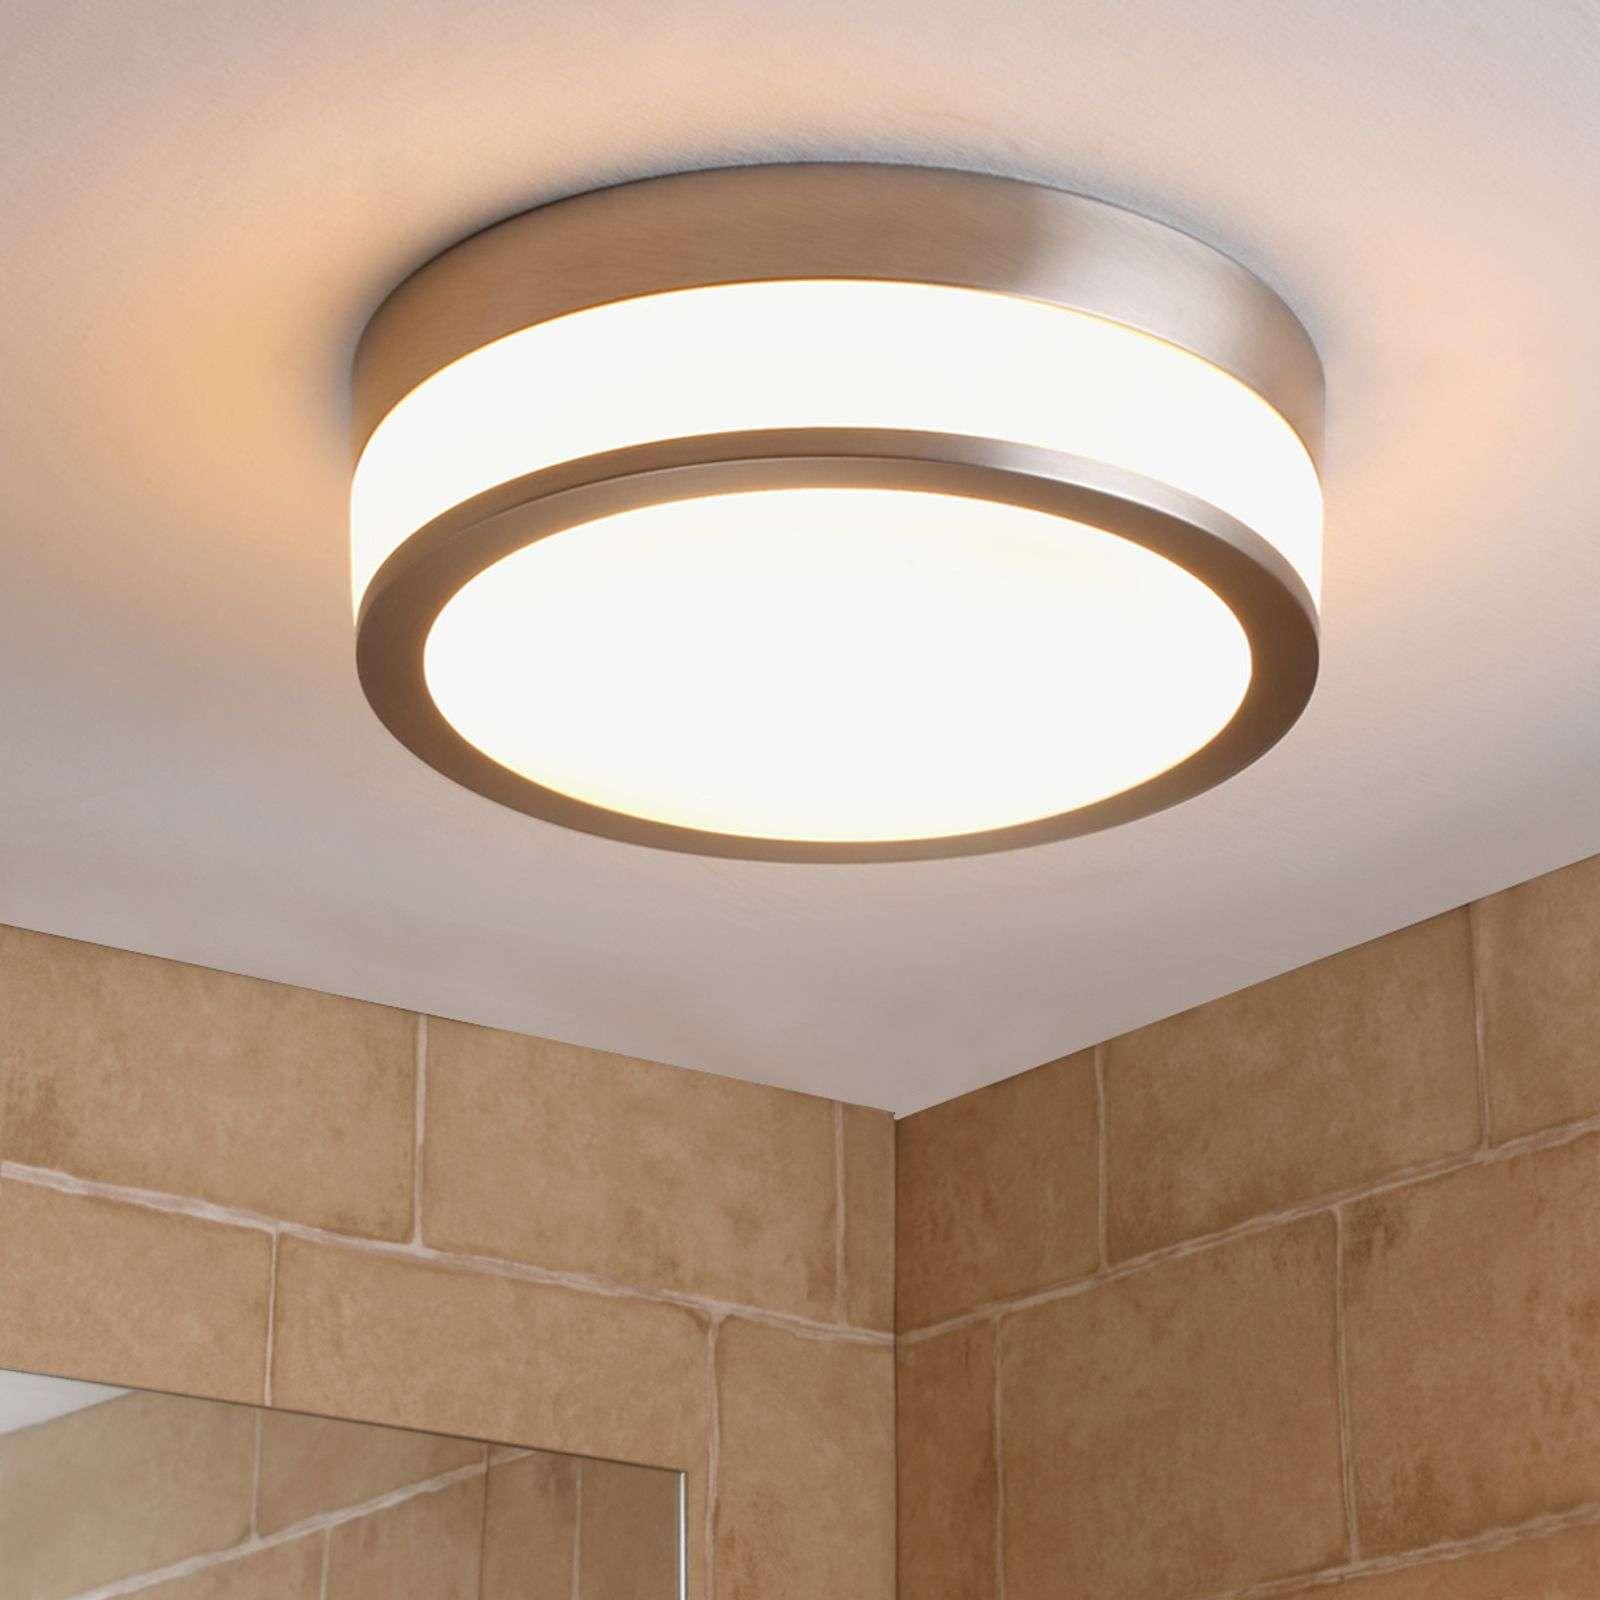 Lampenwelt.com Plafonnier de salle de bain LED Flavi, nickel mat - LAMPENWELT.com